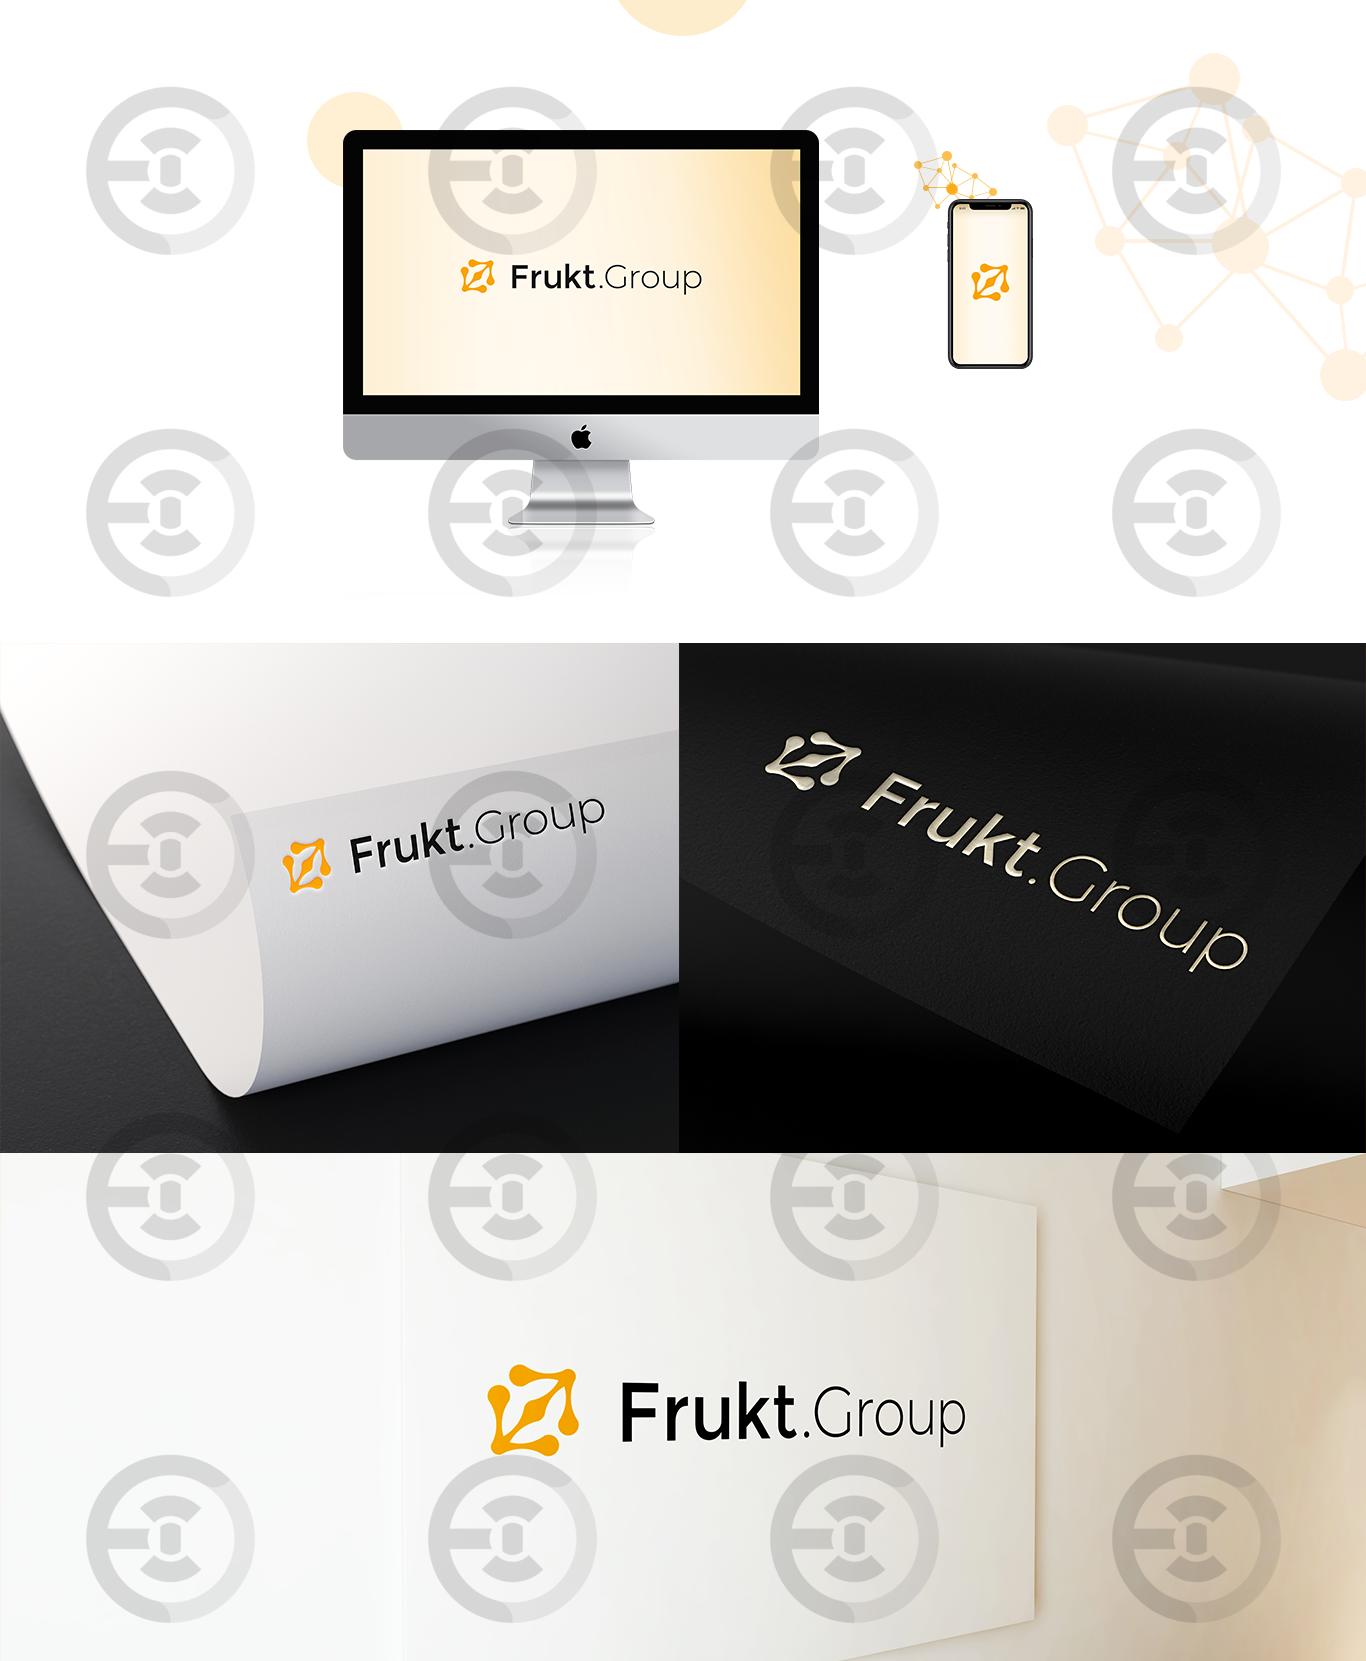 _FruktGroupLogo.png